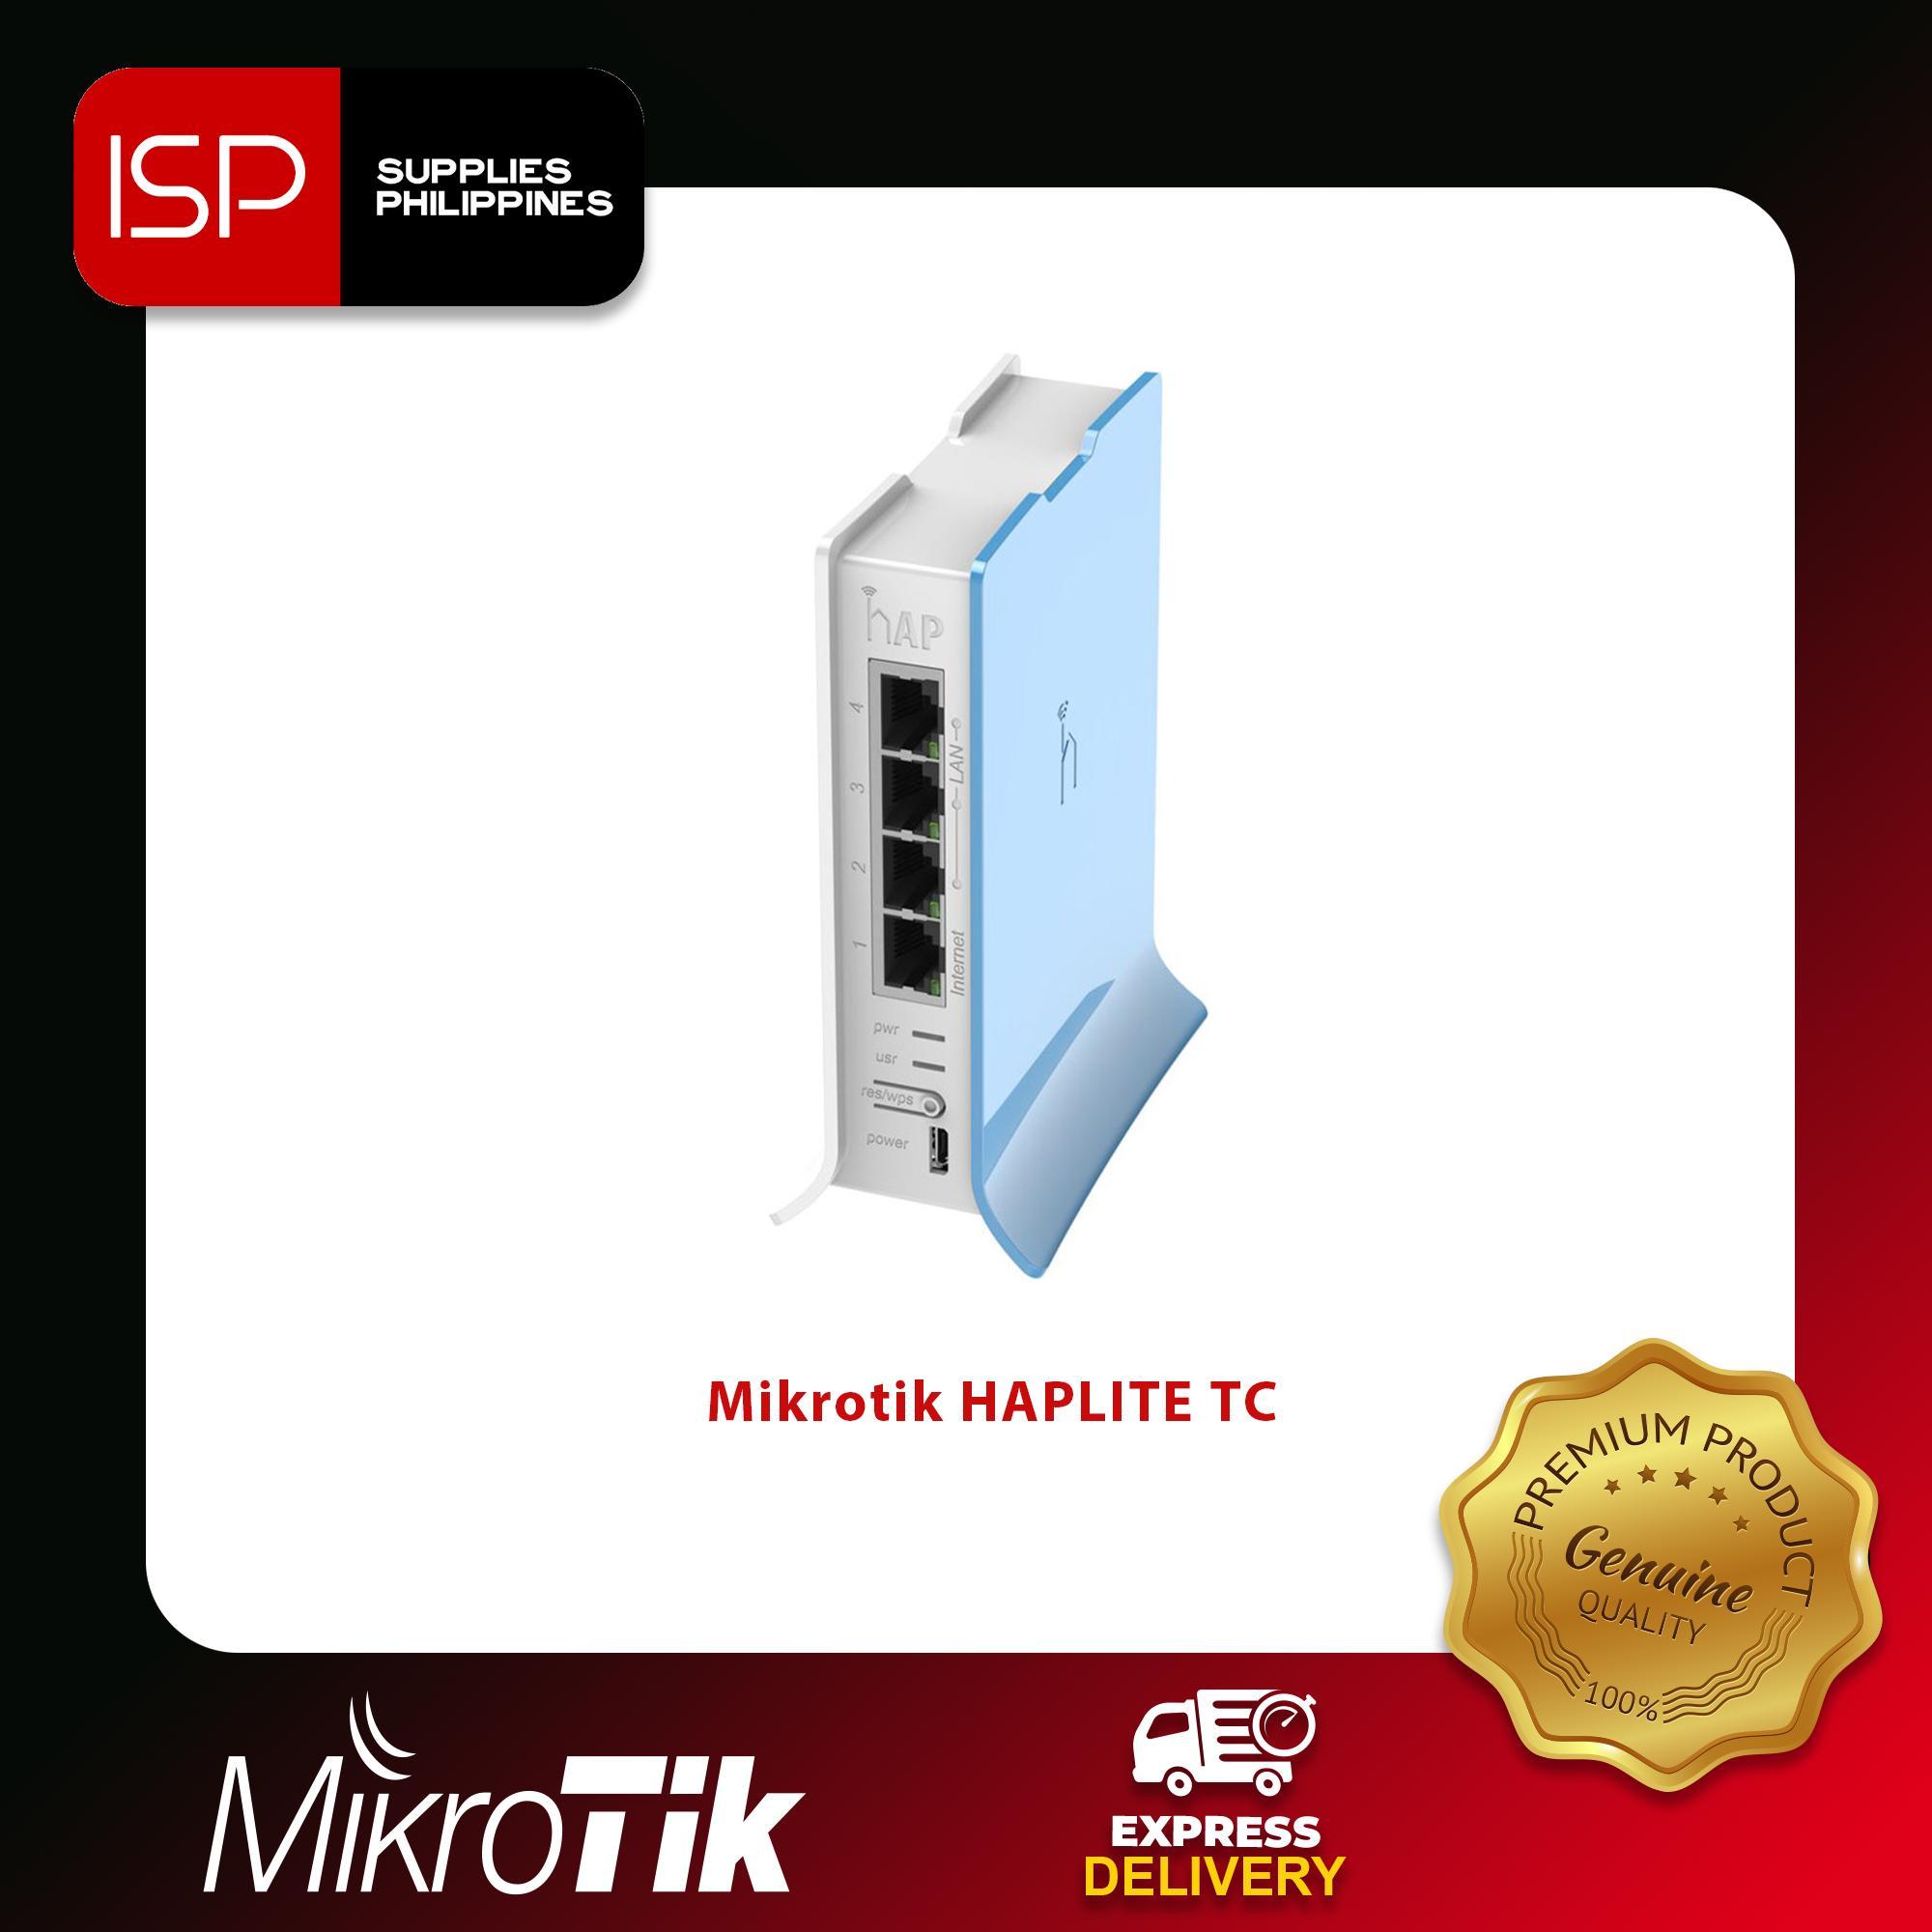 Mikrotik HAPLITE TC